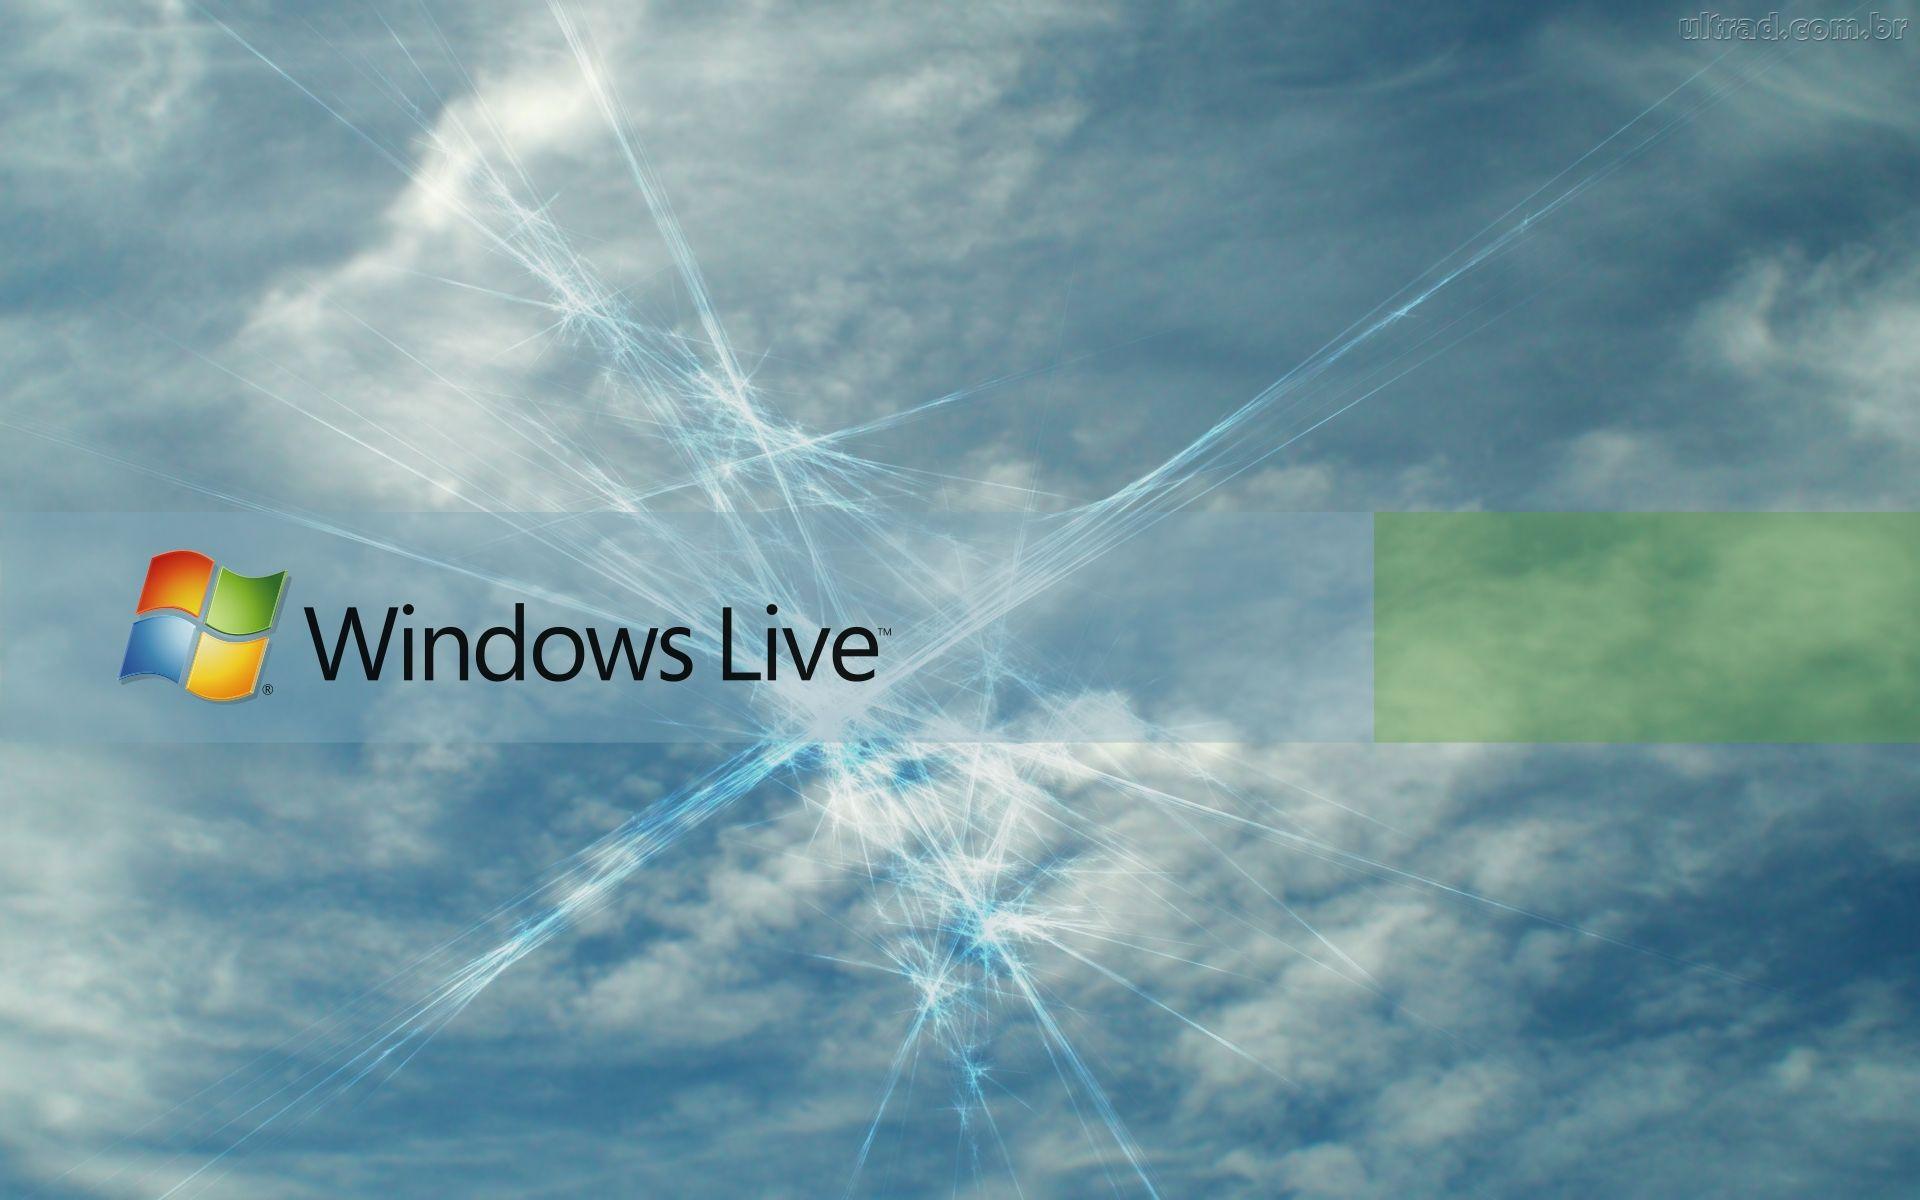 Free Windows Live Wallpaper HD #575 Wallpaper   ForWallpapers.com